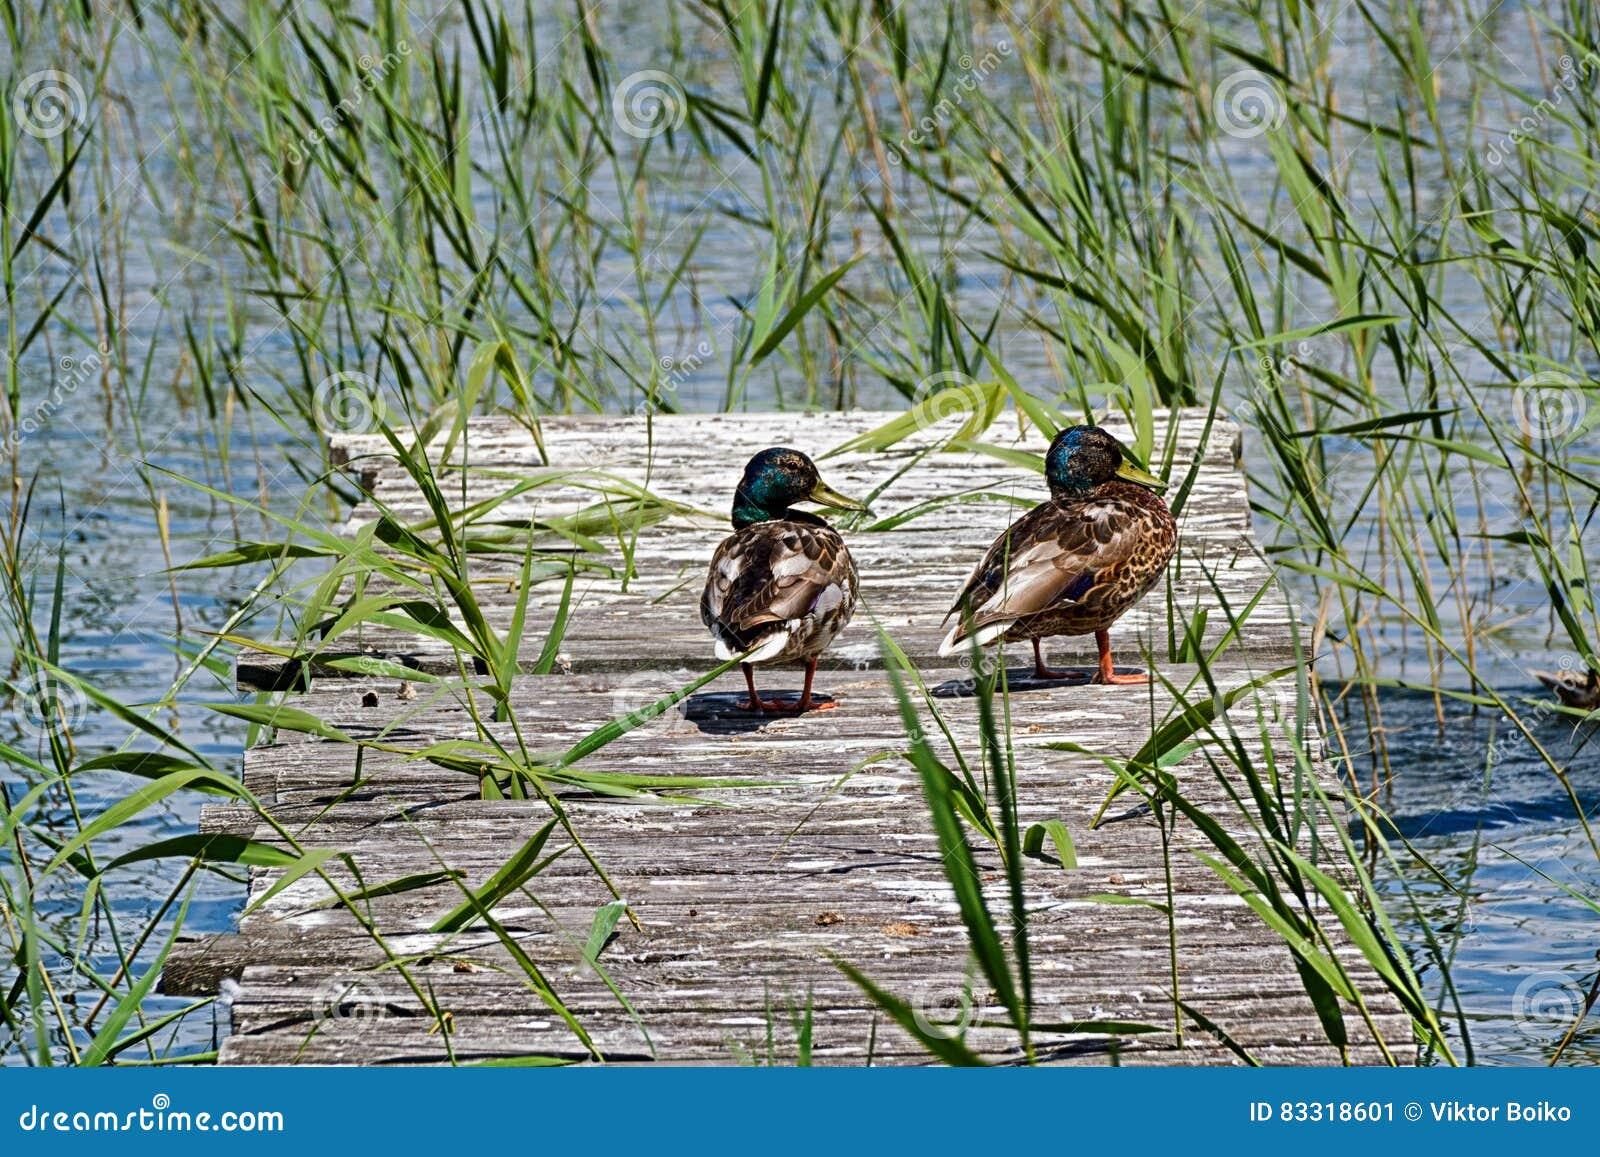 Birds recreation on the berth